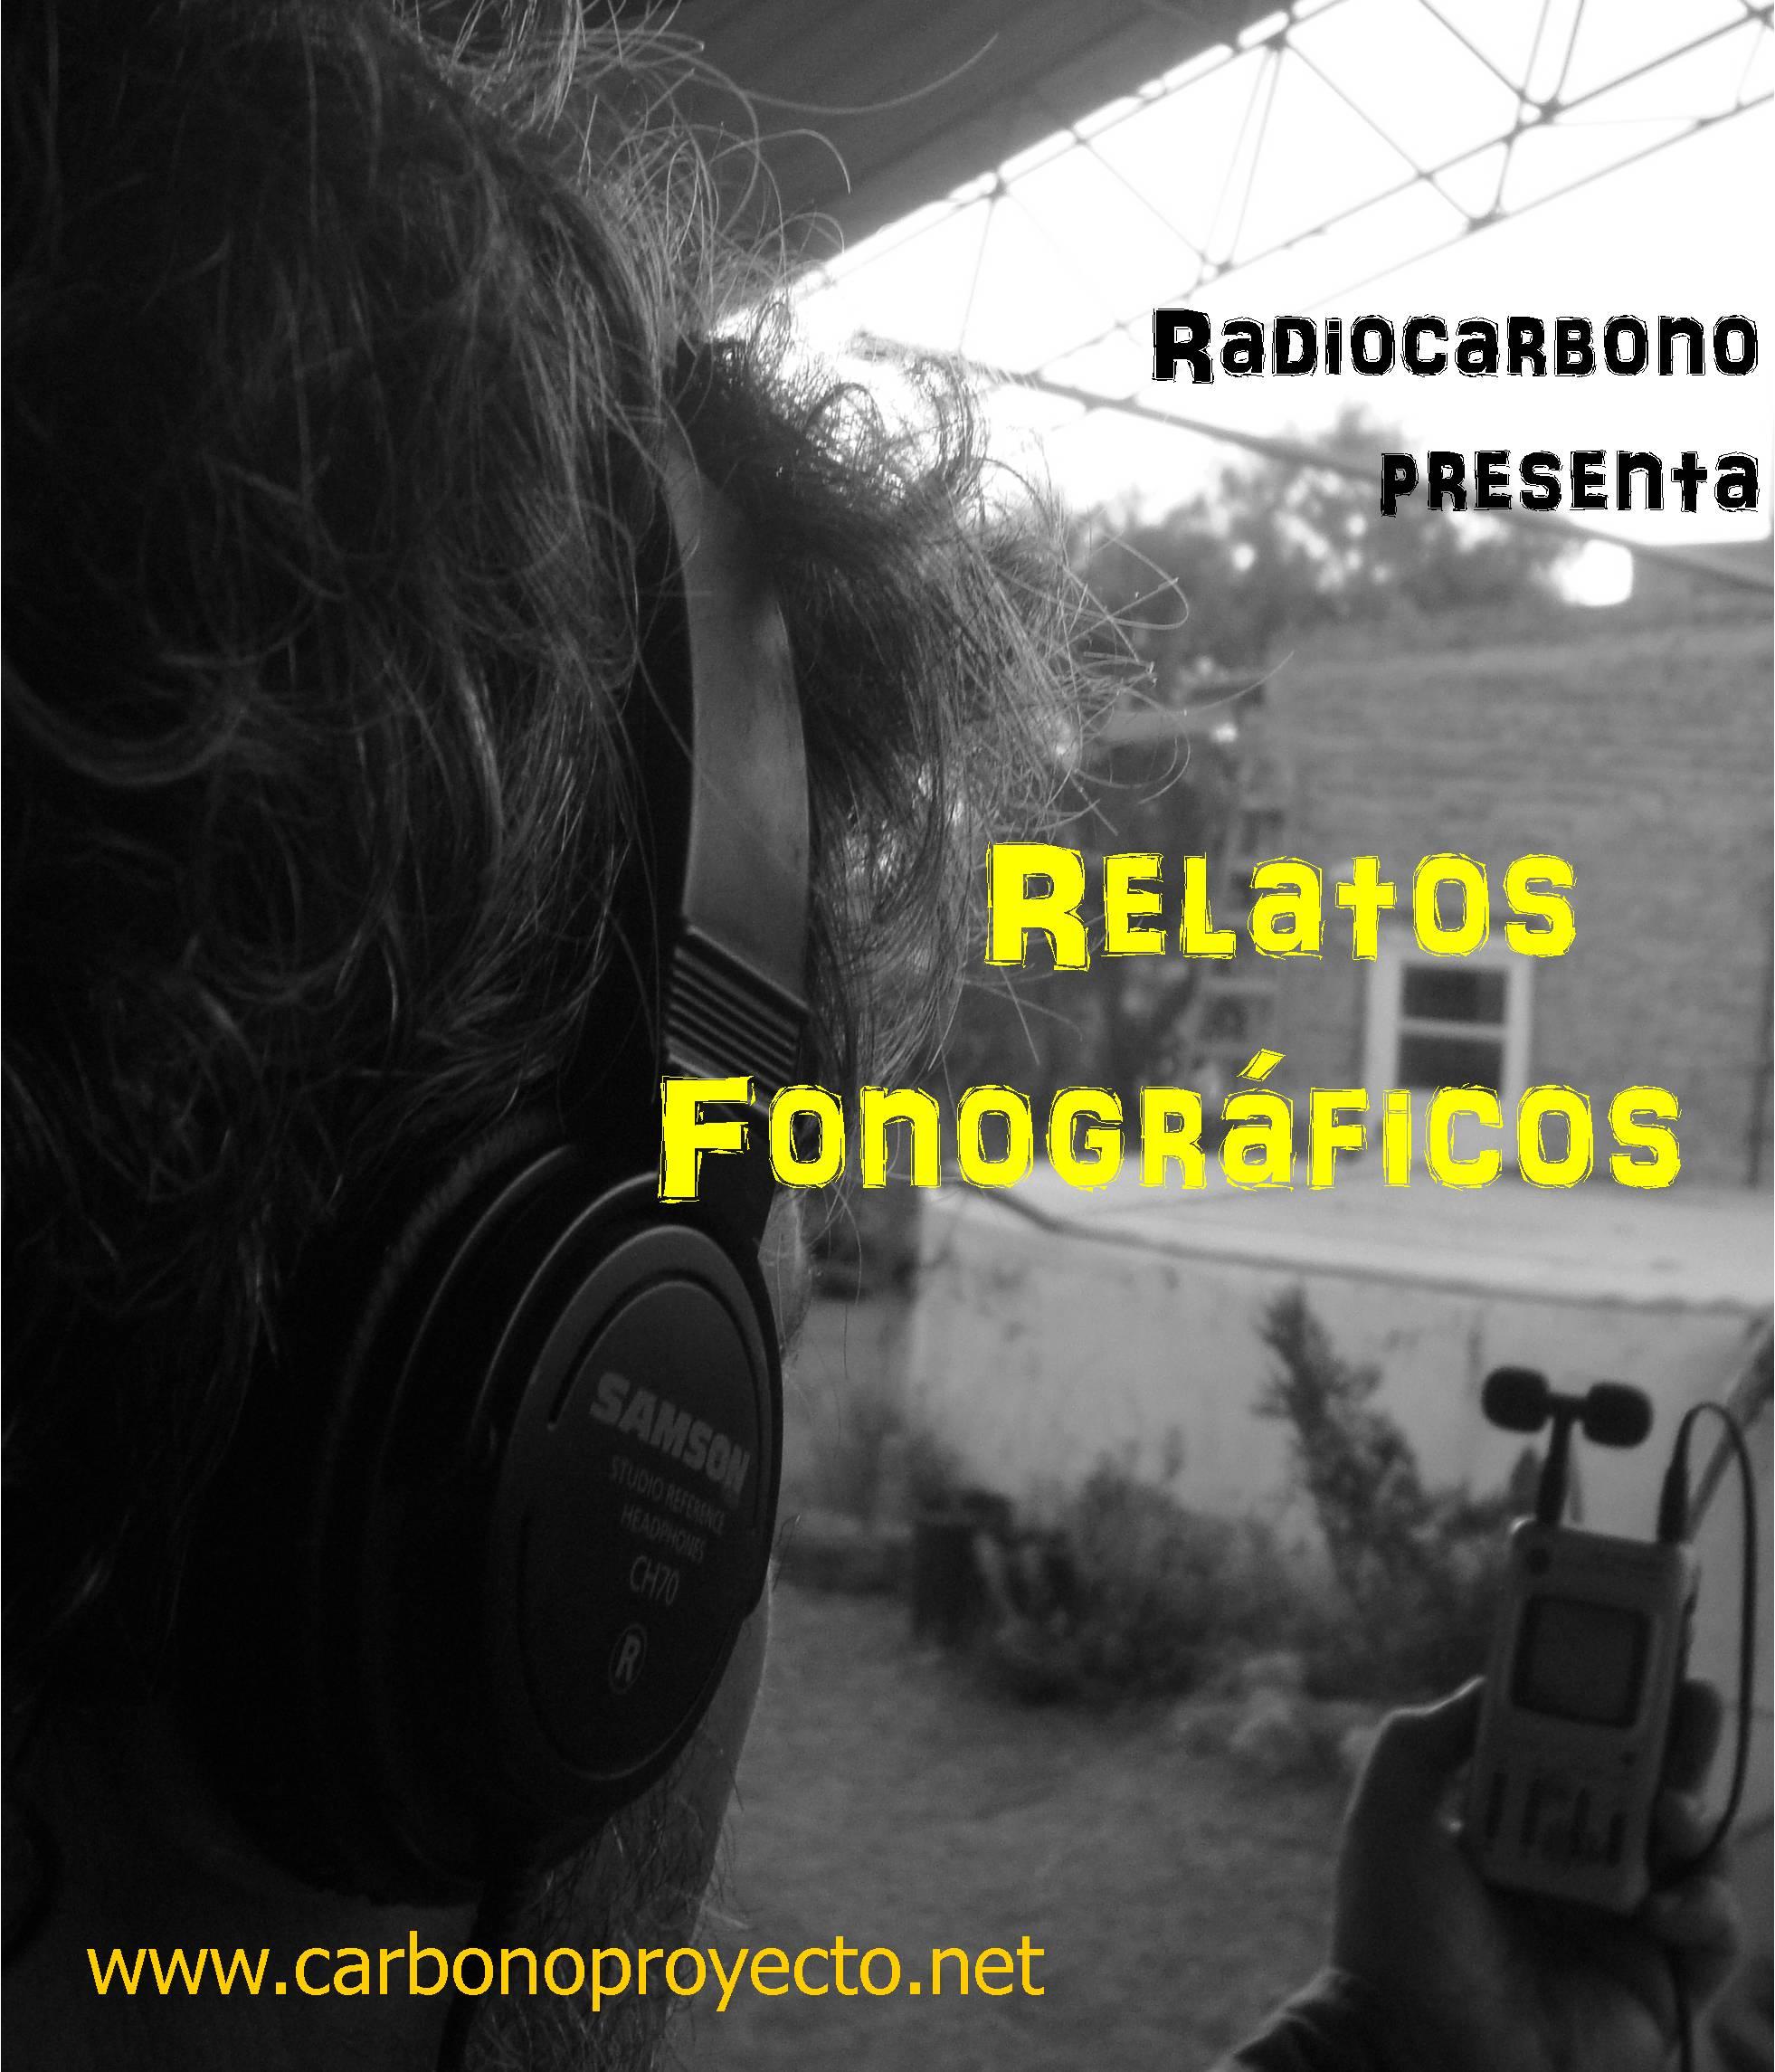 Relatos Fonográficos